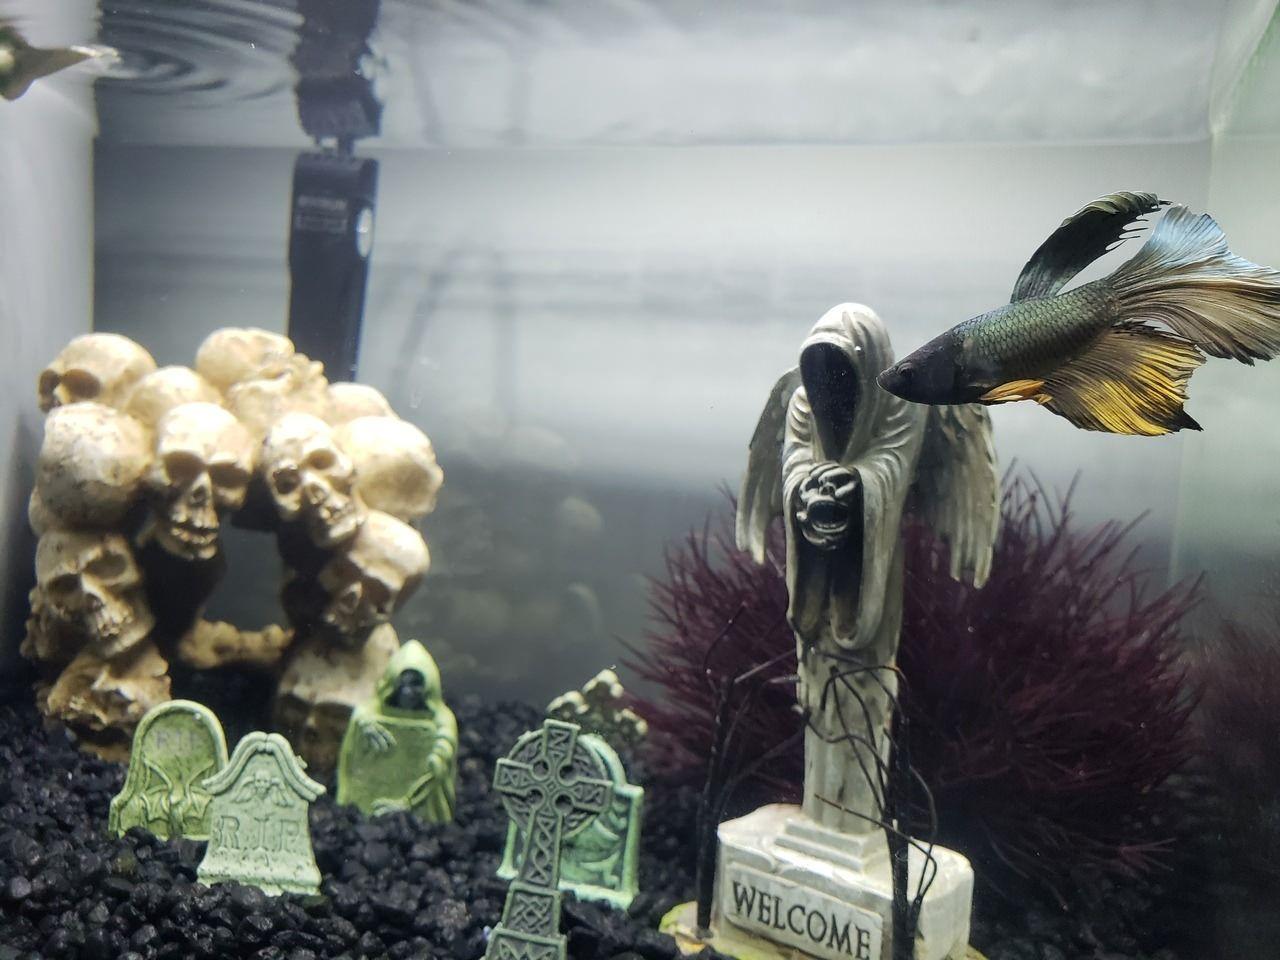 Happy Halloween Scary Fish Fish Tank Decorations Fish Tank Themes